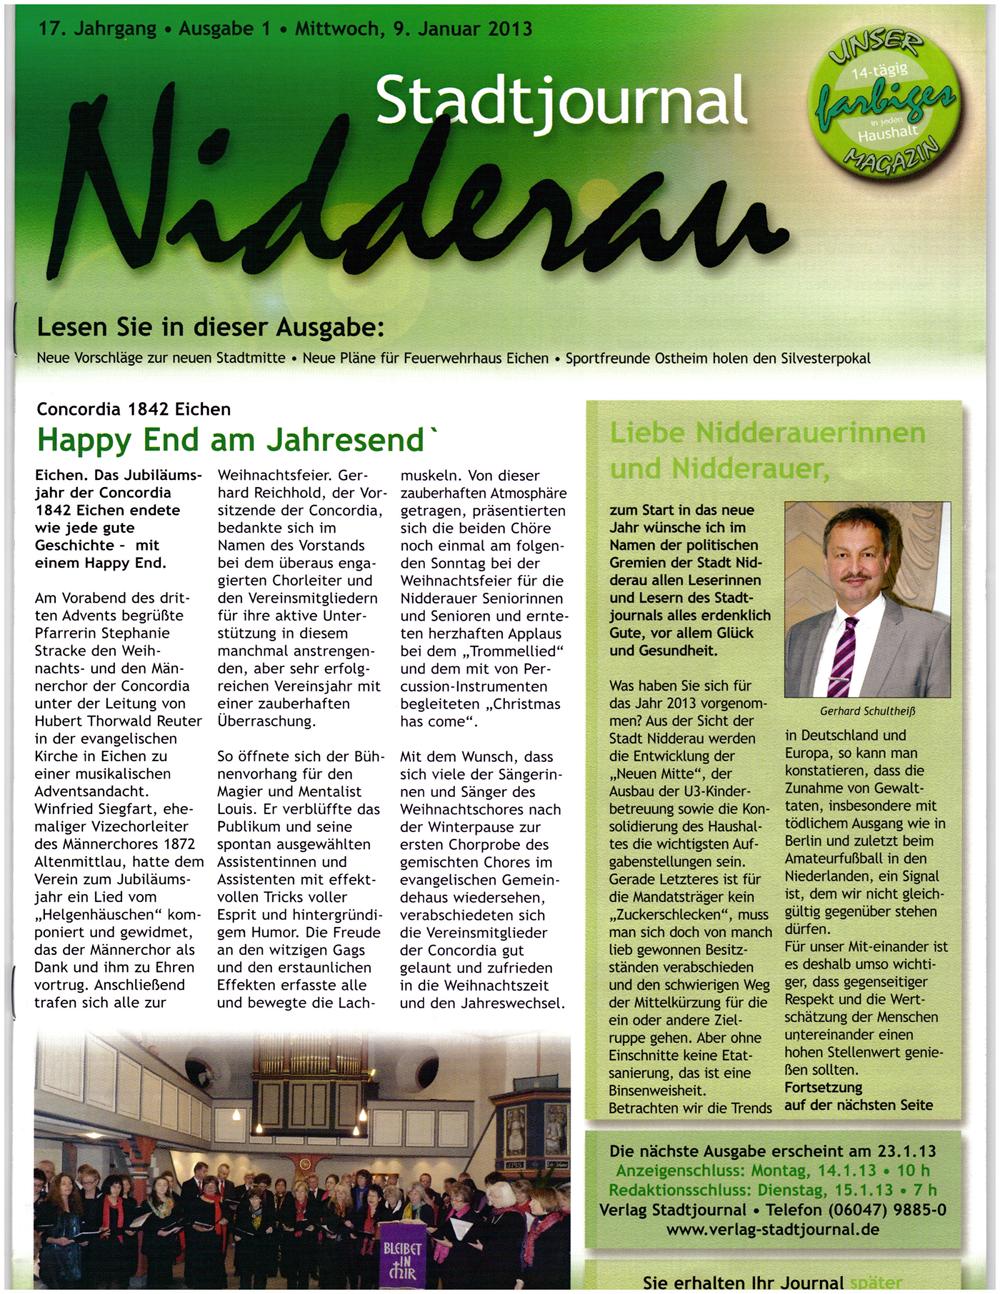 2013_01_09-Stadjournal-Nidderau